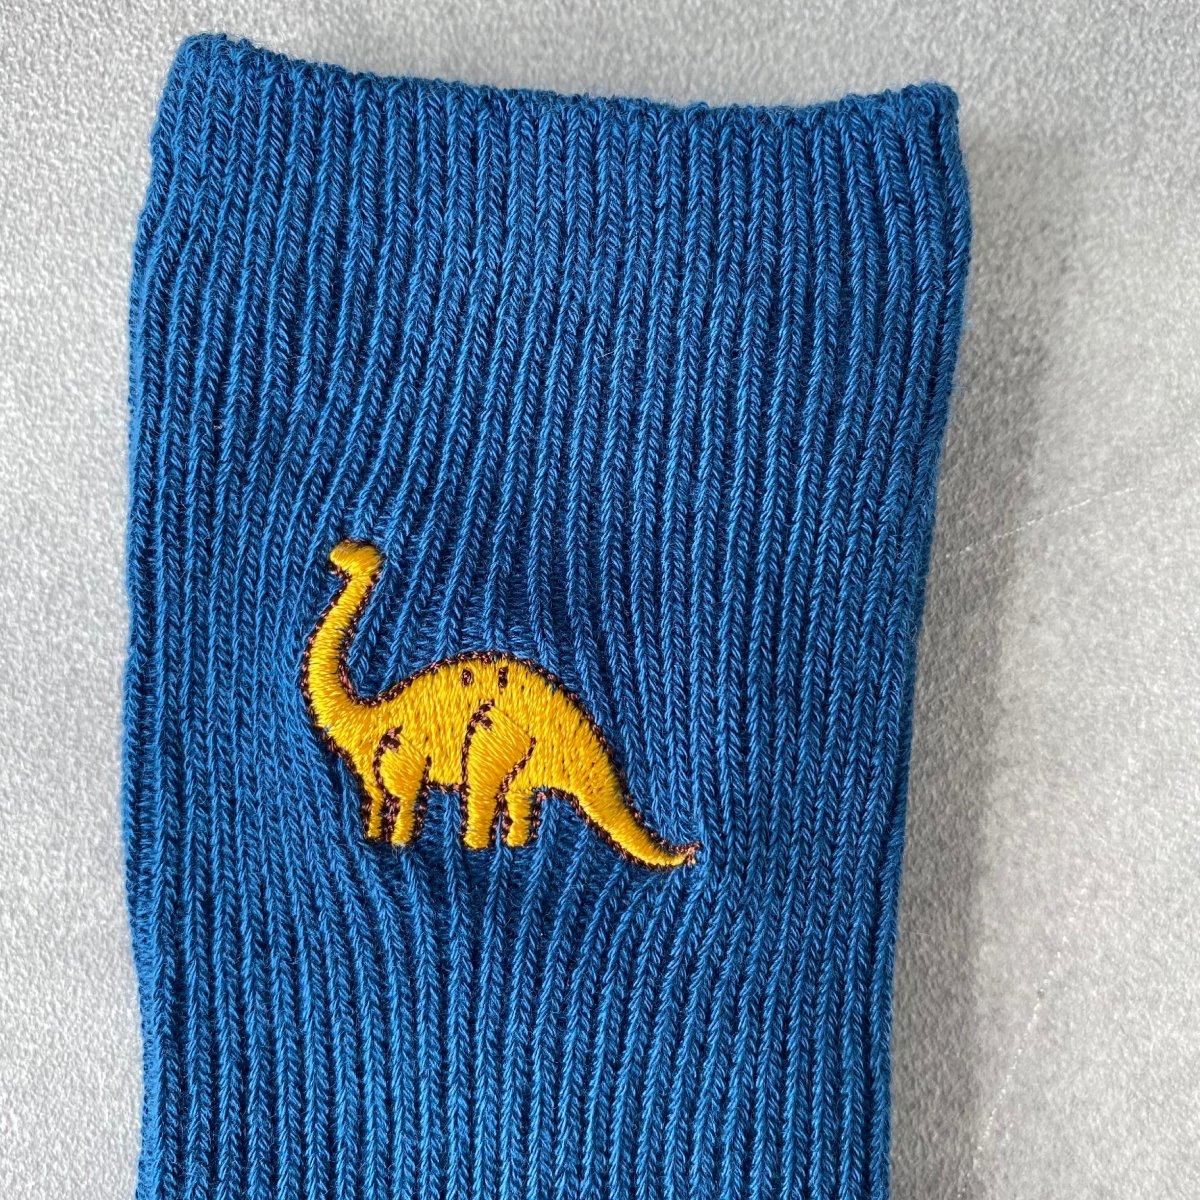 【KIDS】Dino Socks 詳細画像10